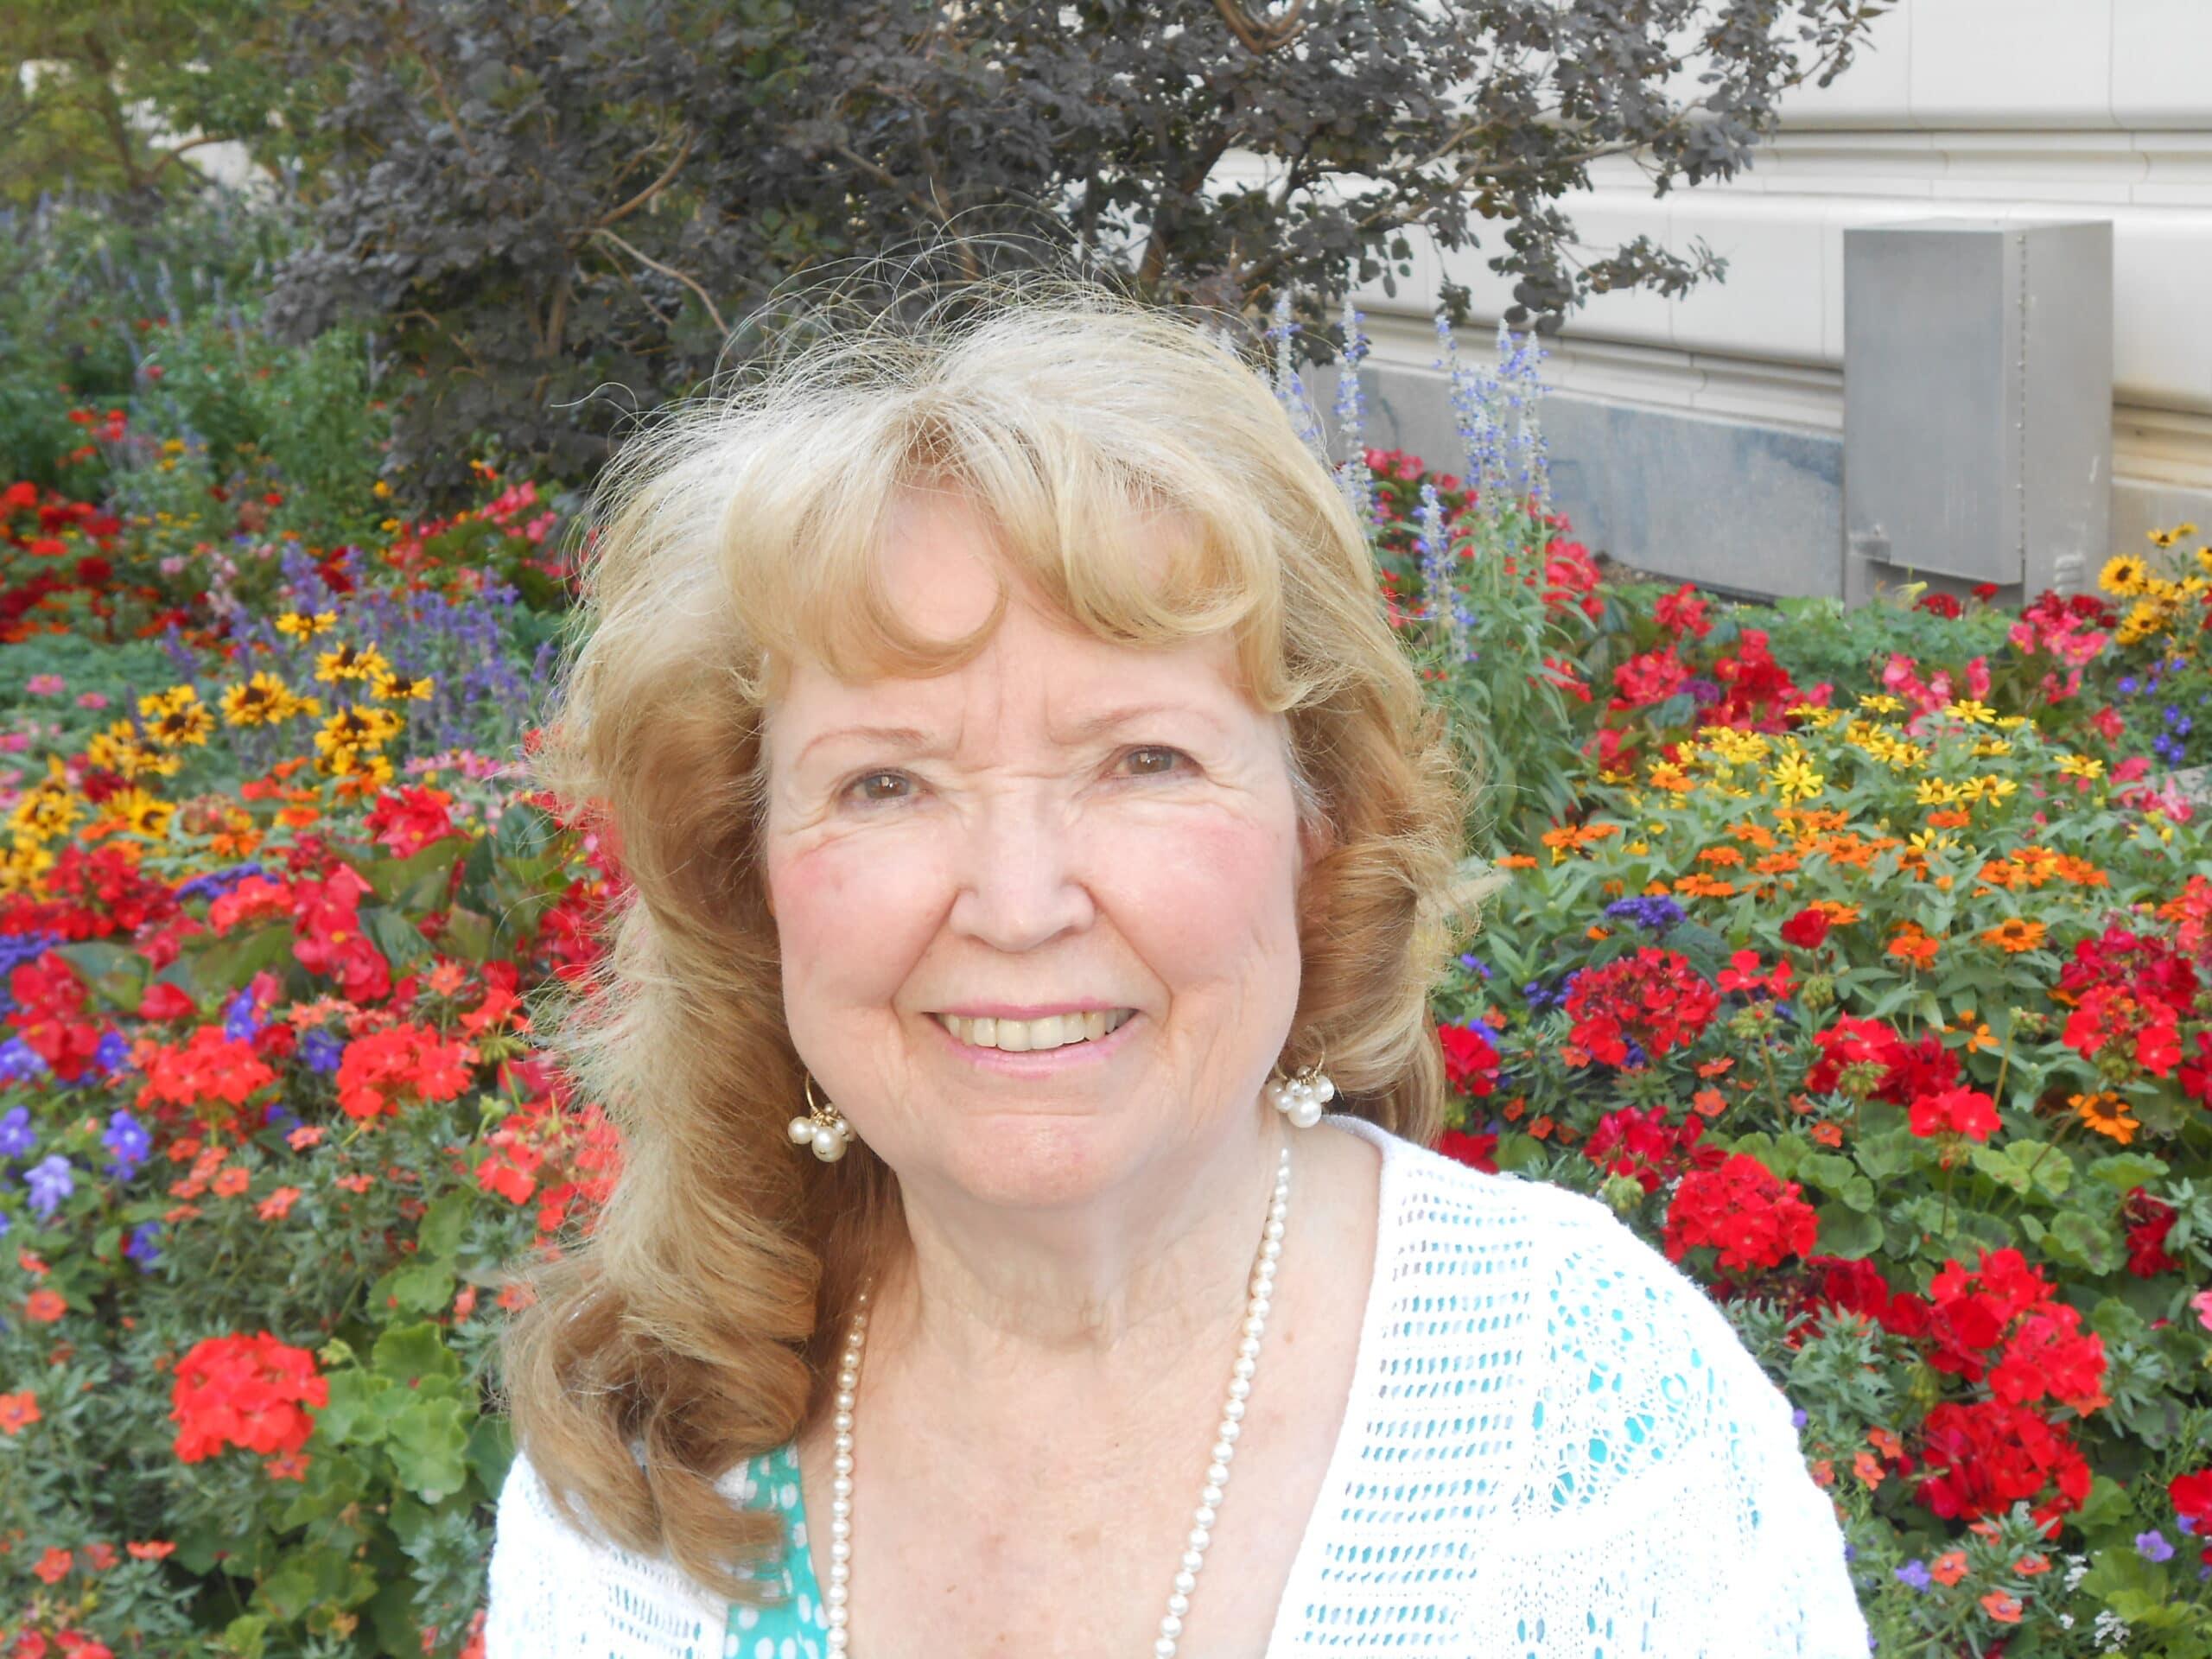 Christine Clarkson Kelly